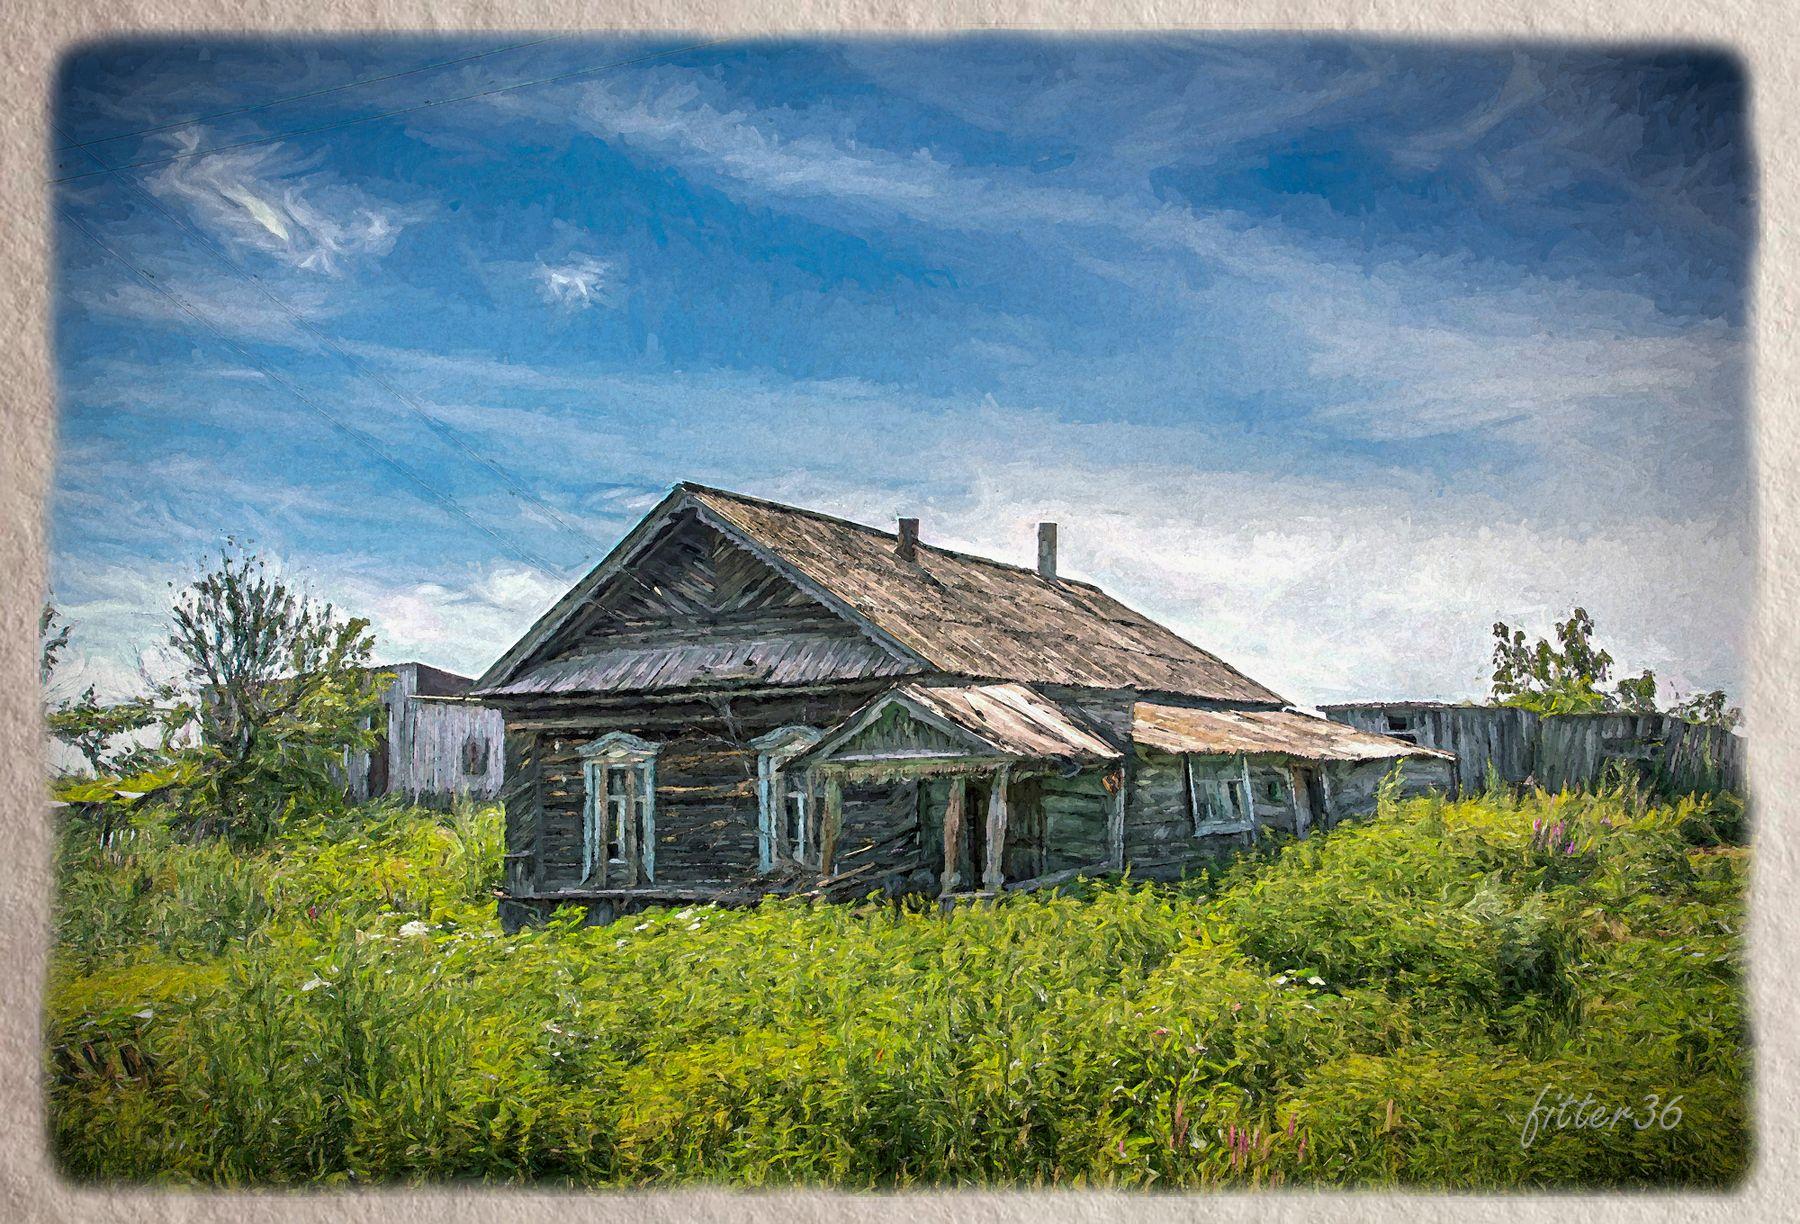 Дом fitter36 село Тайдаково самарский край